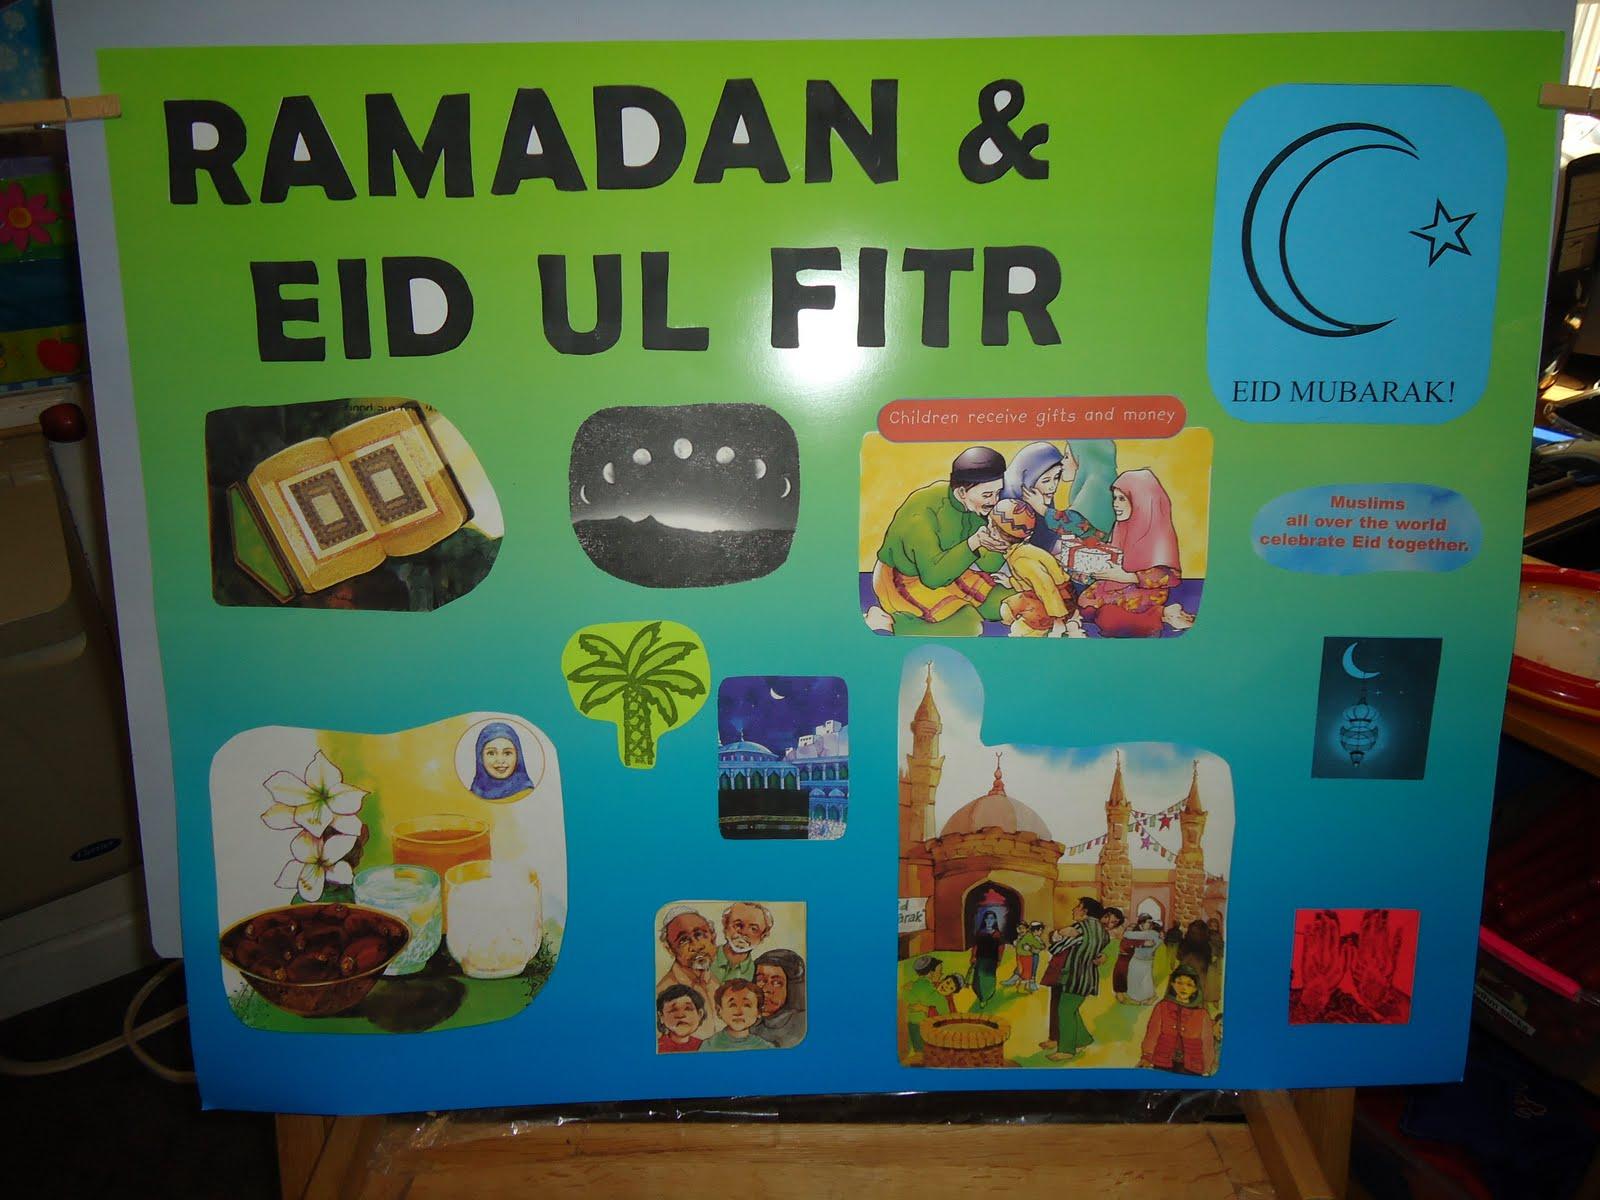 Little Illuminations Celebrating Ramadan And El Ud Fitr